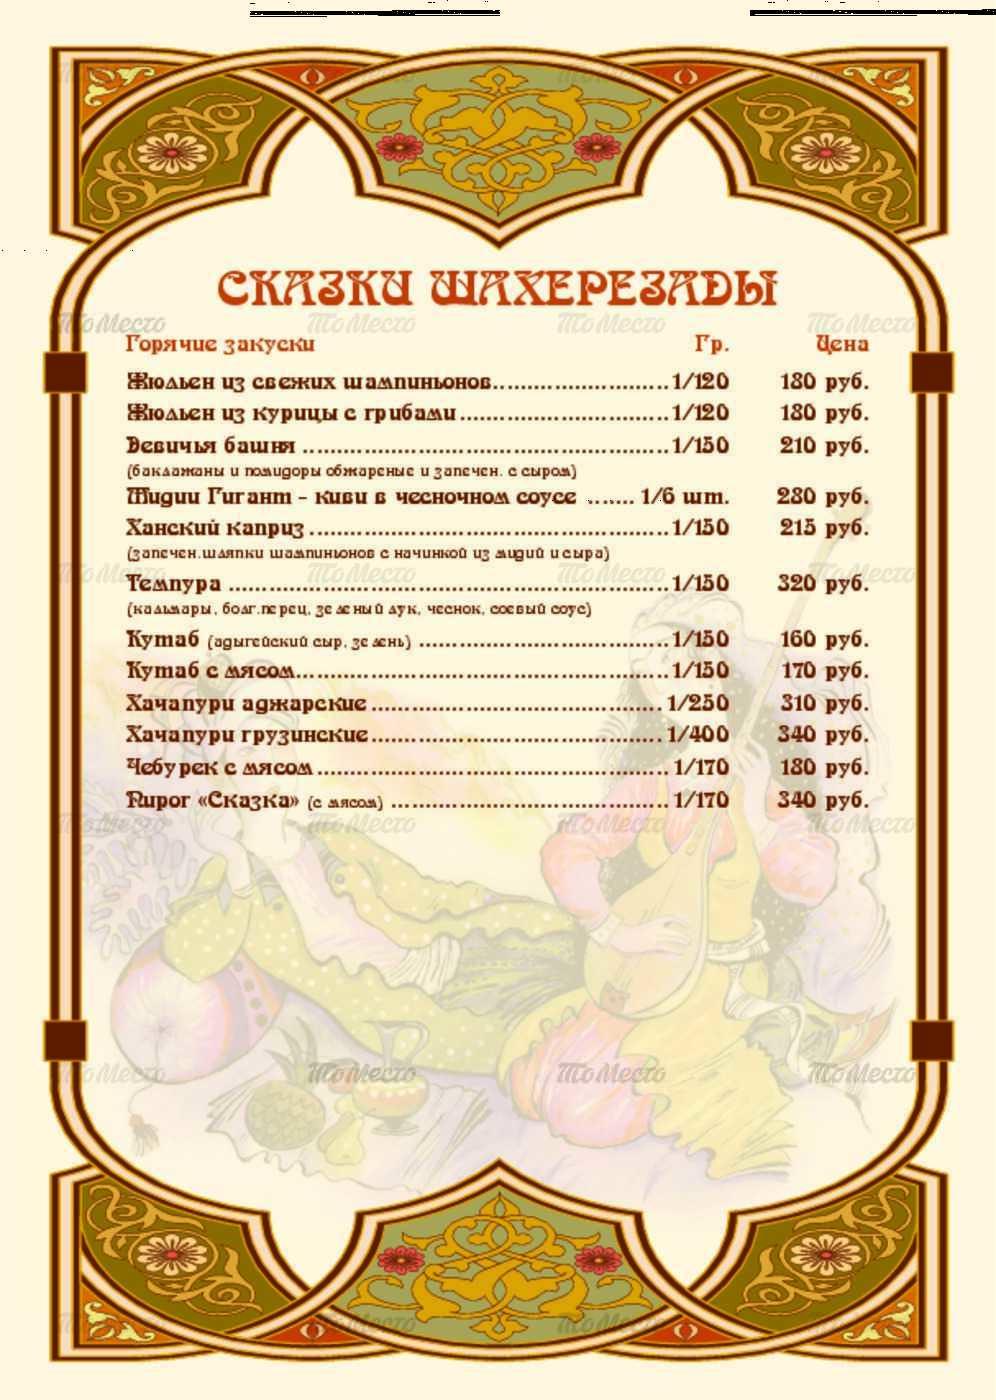 Меню ресторана Сказки Шахерезады на Московском проспекте